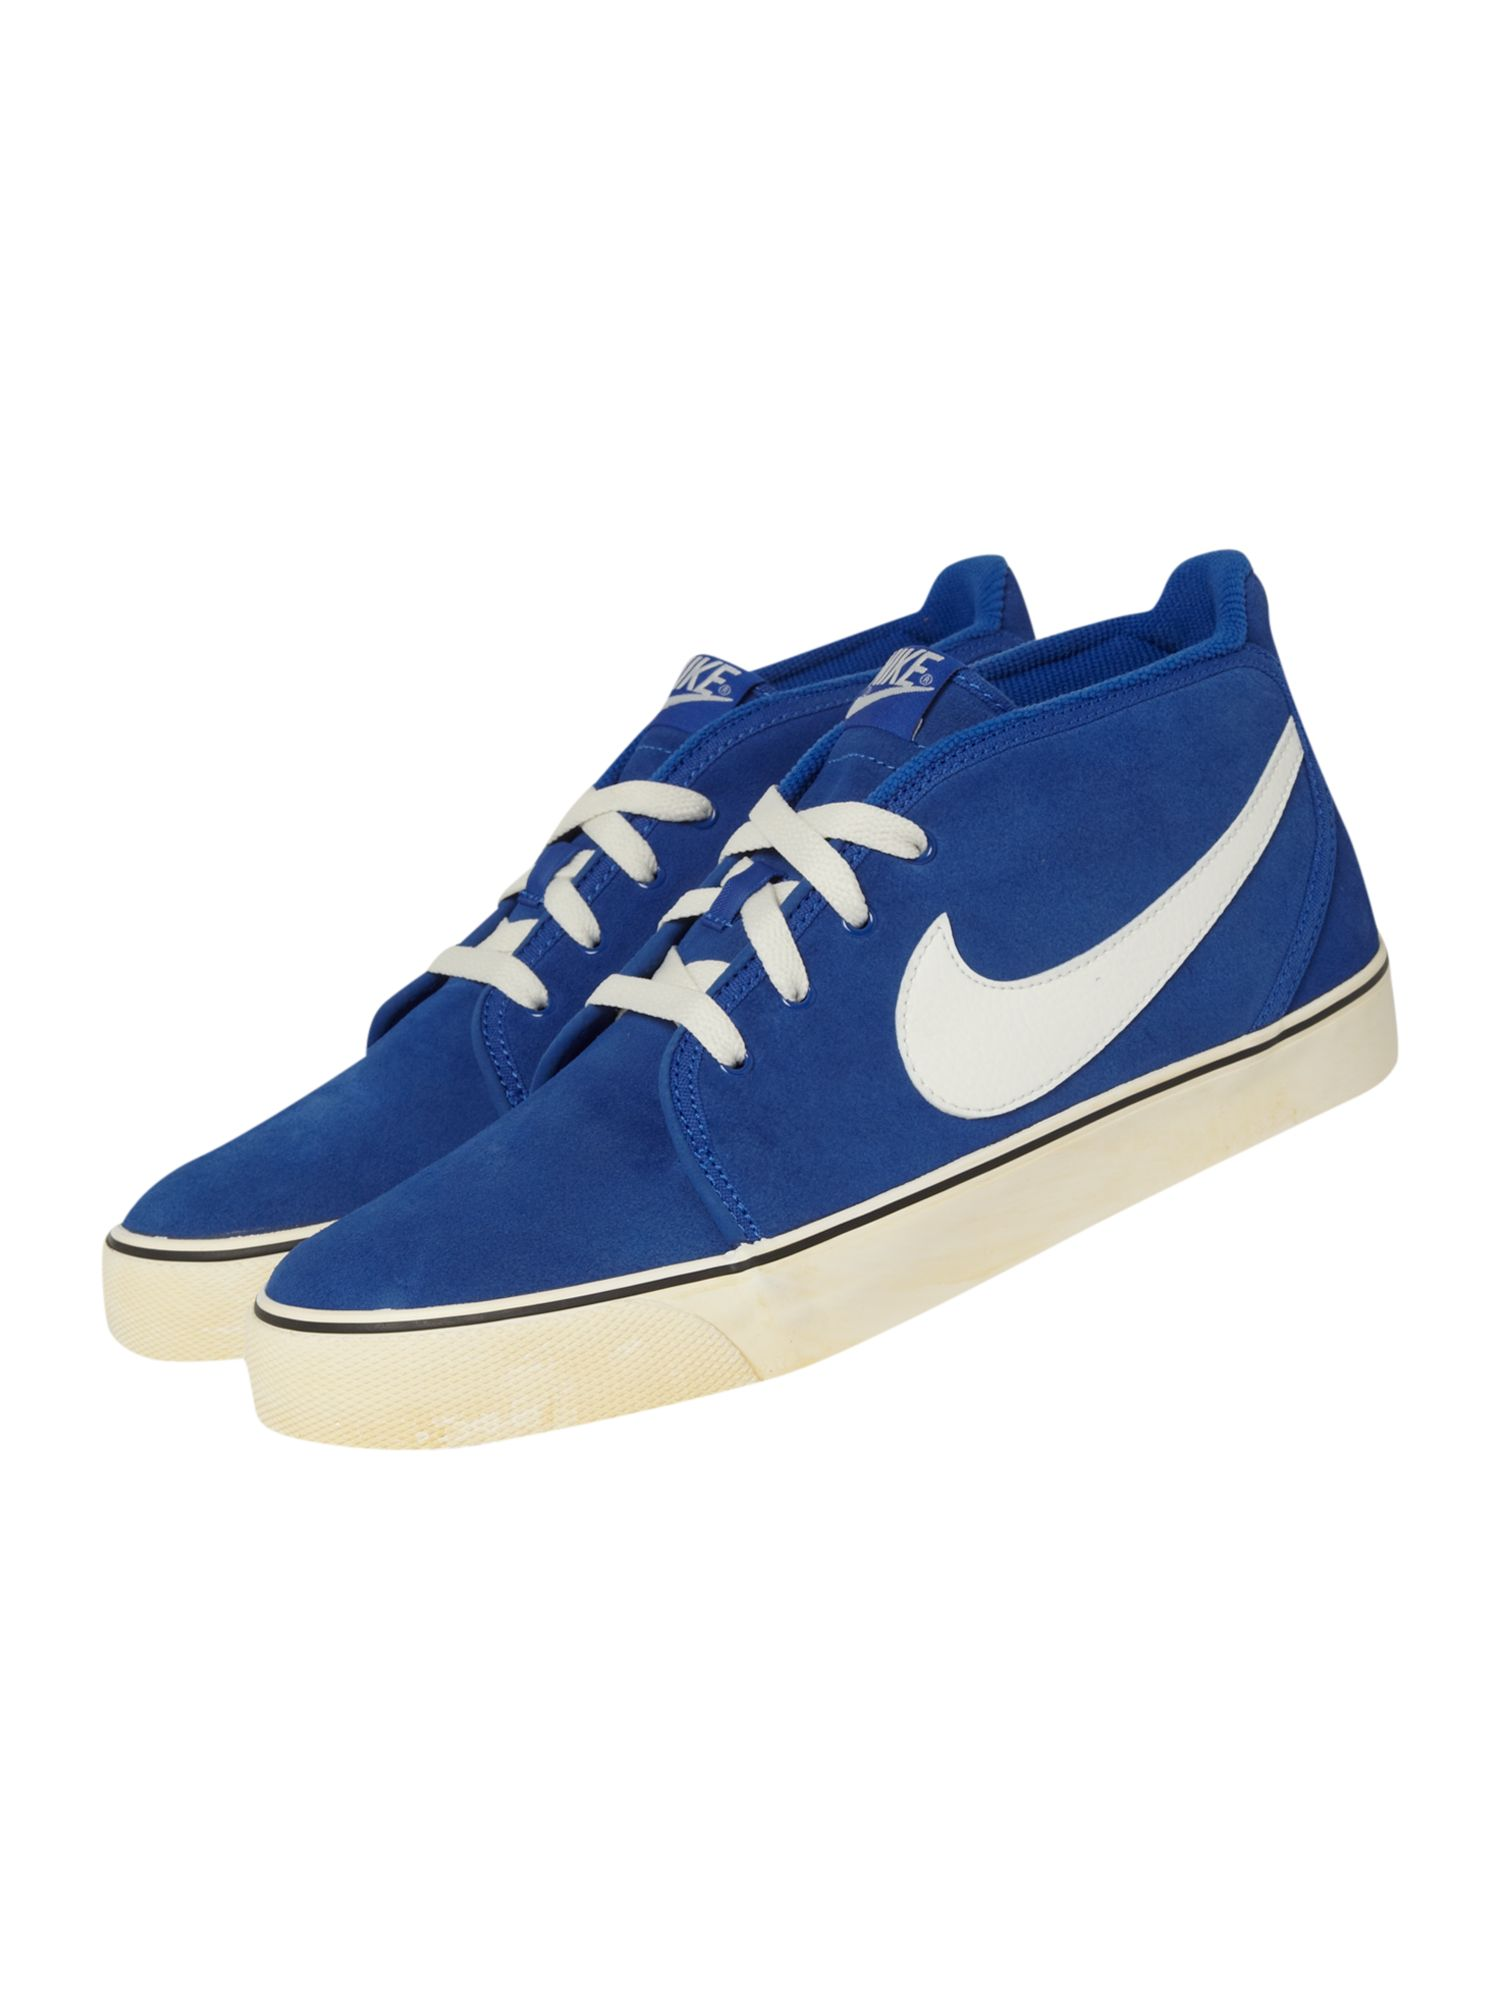 Toki Shoes Nike